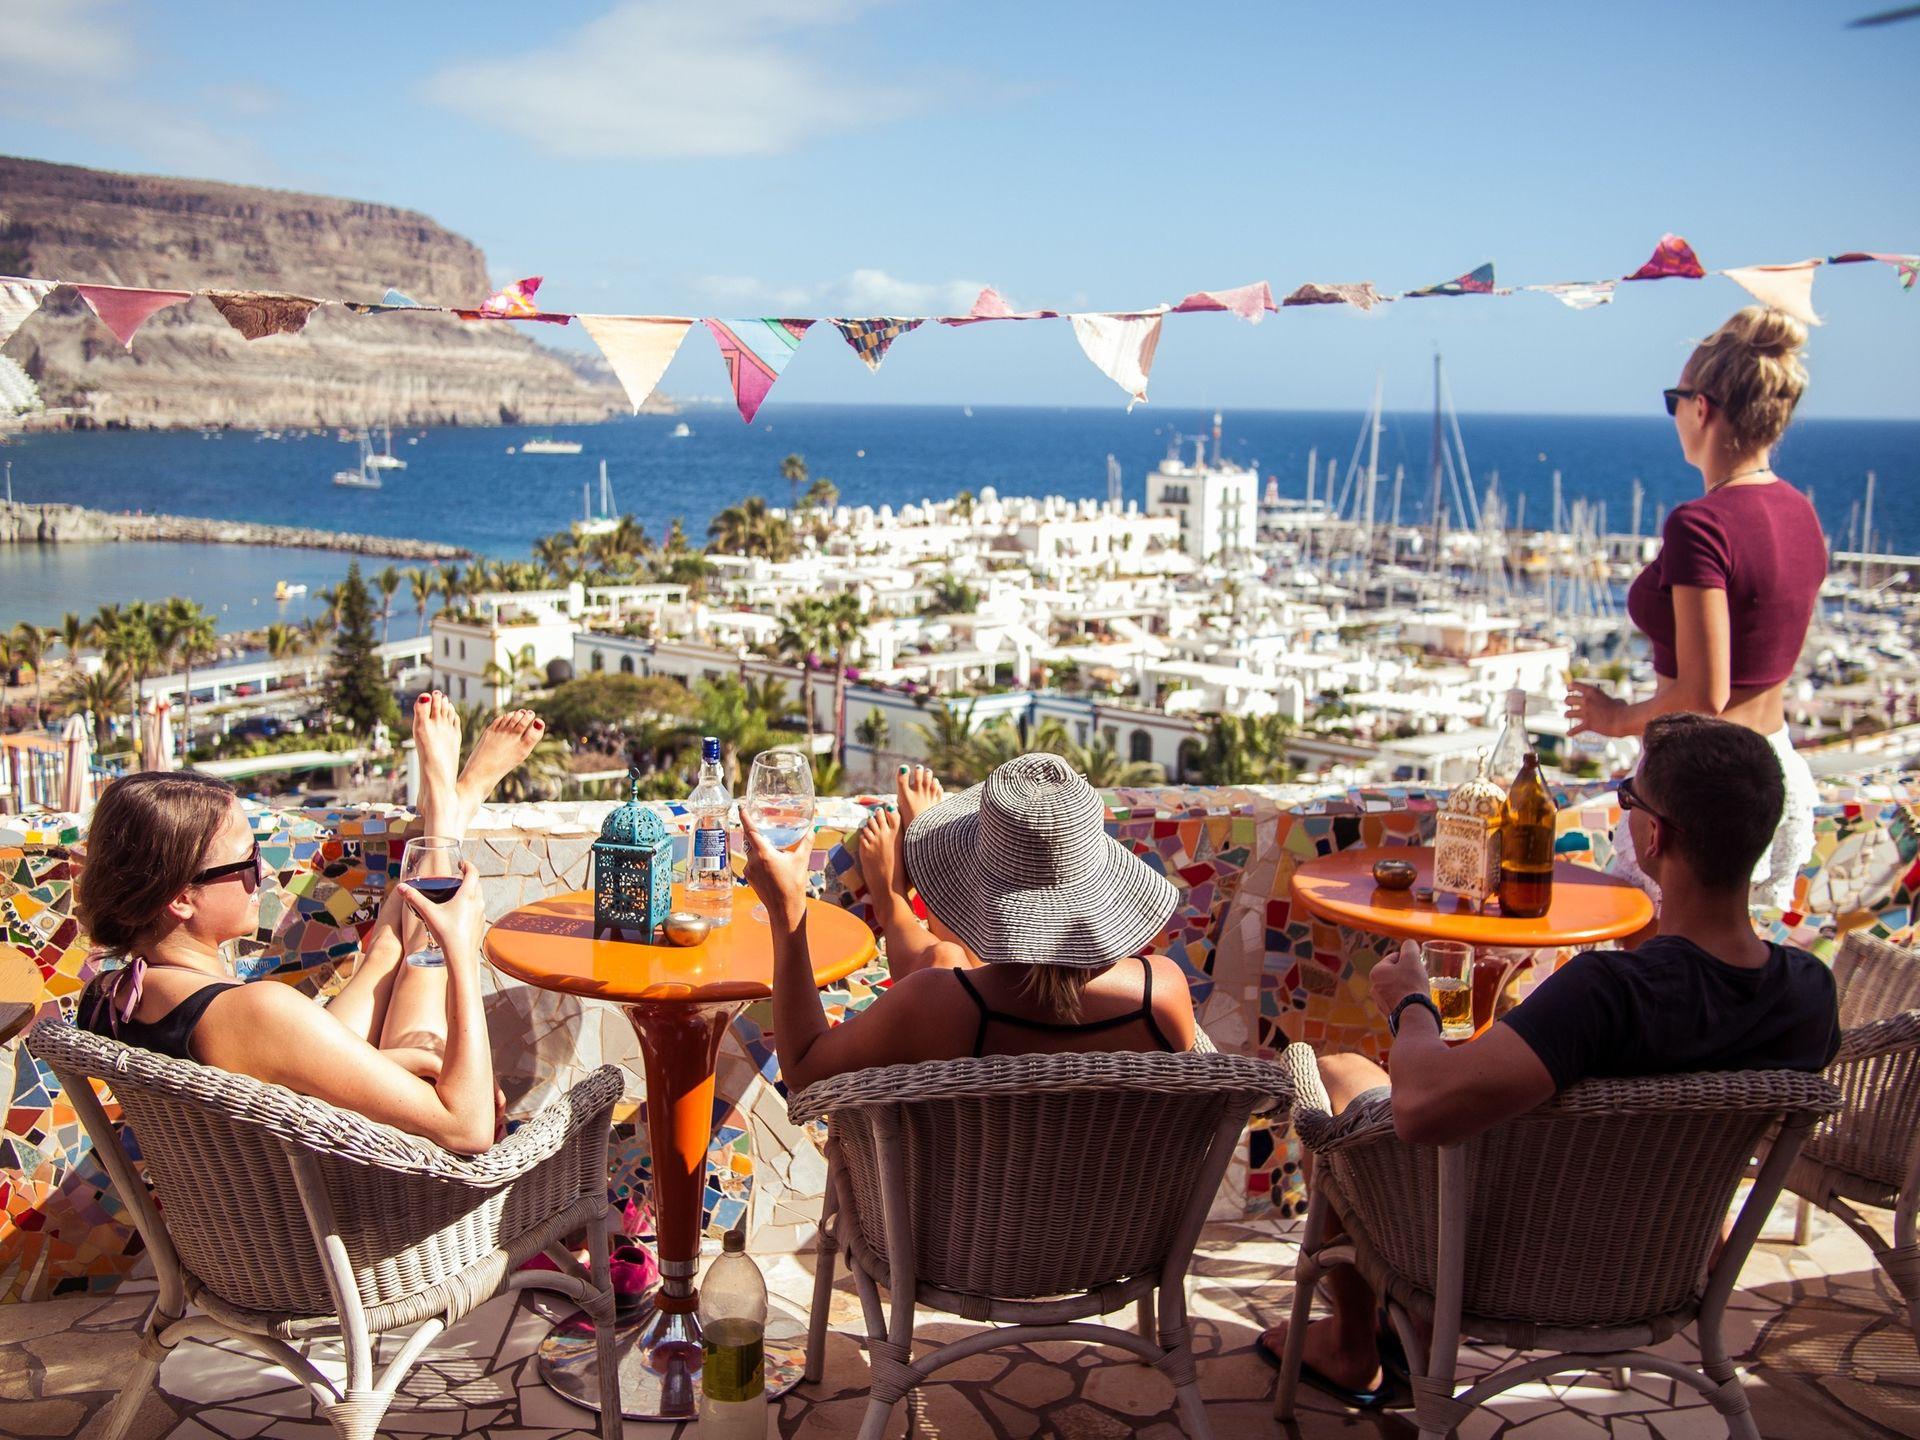 Spain backpacking adventures group friends travel workaway relax wine harbour spain